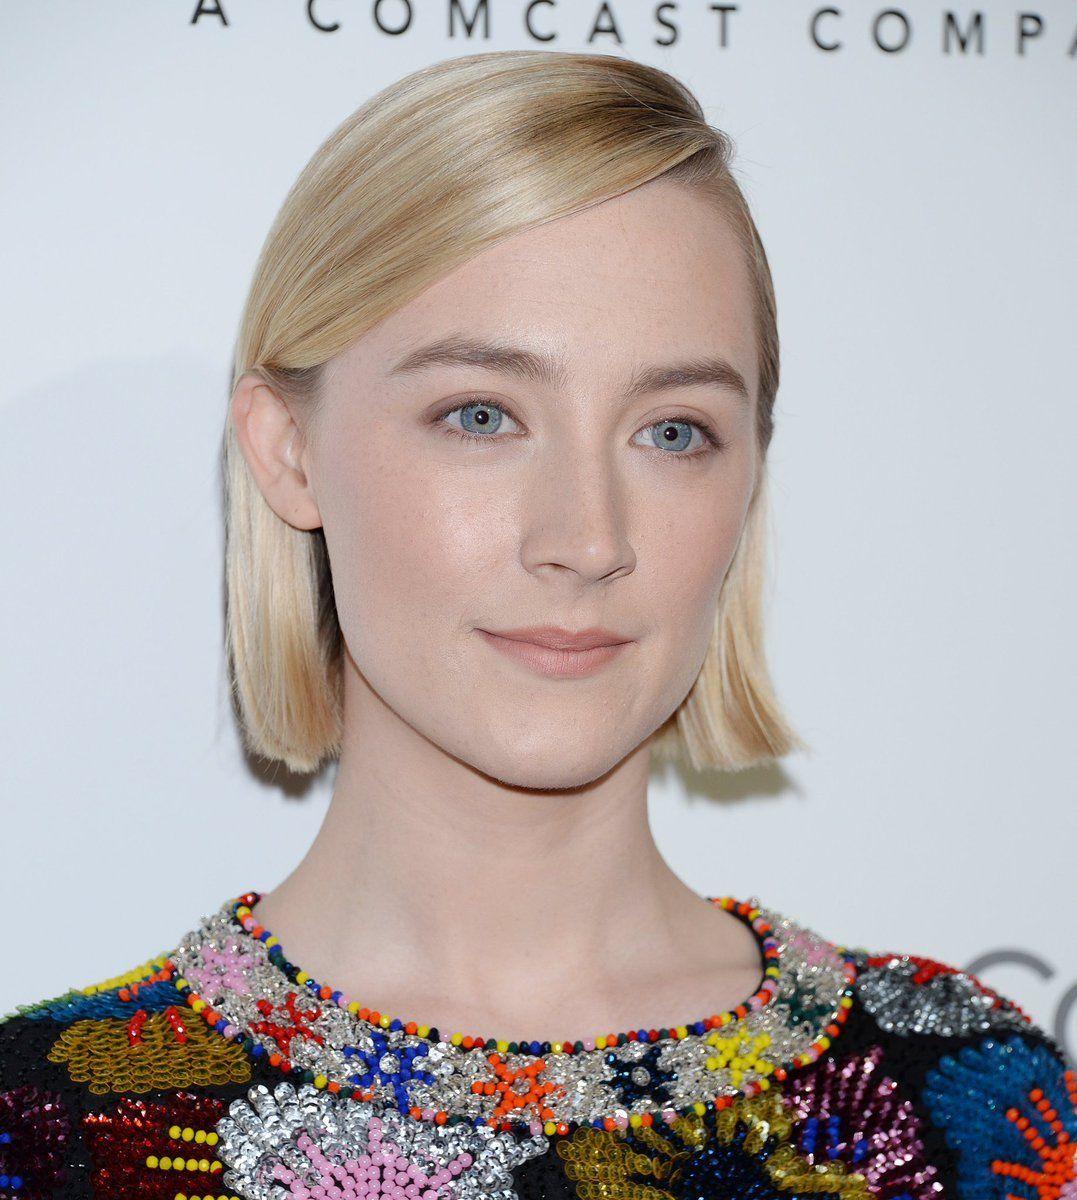 Pin by ̗̀ ɱɑrıssɑ ɑɳɳɛ ̖́ on ⋆ Saoirse Ronan ⋆ Woman